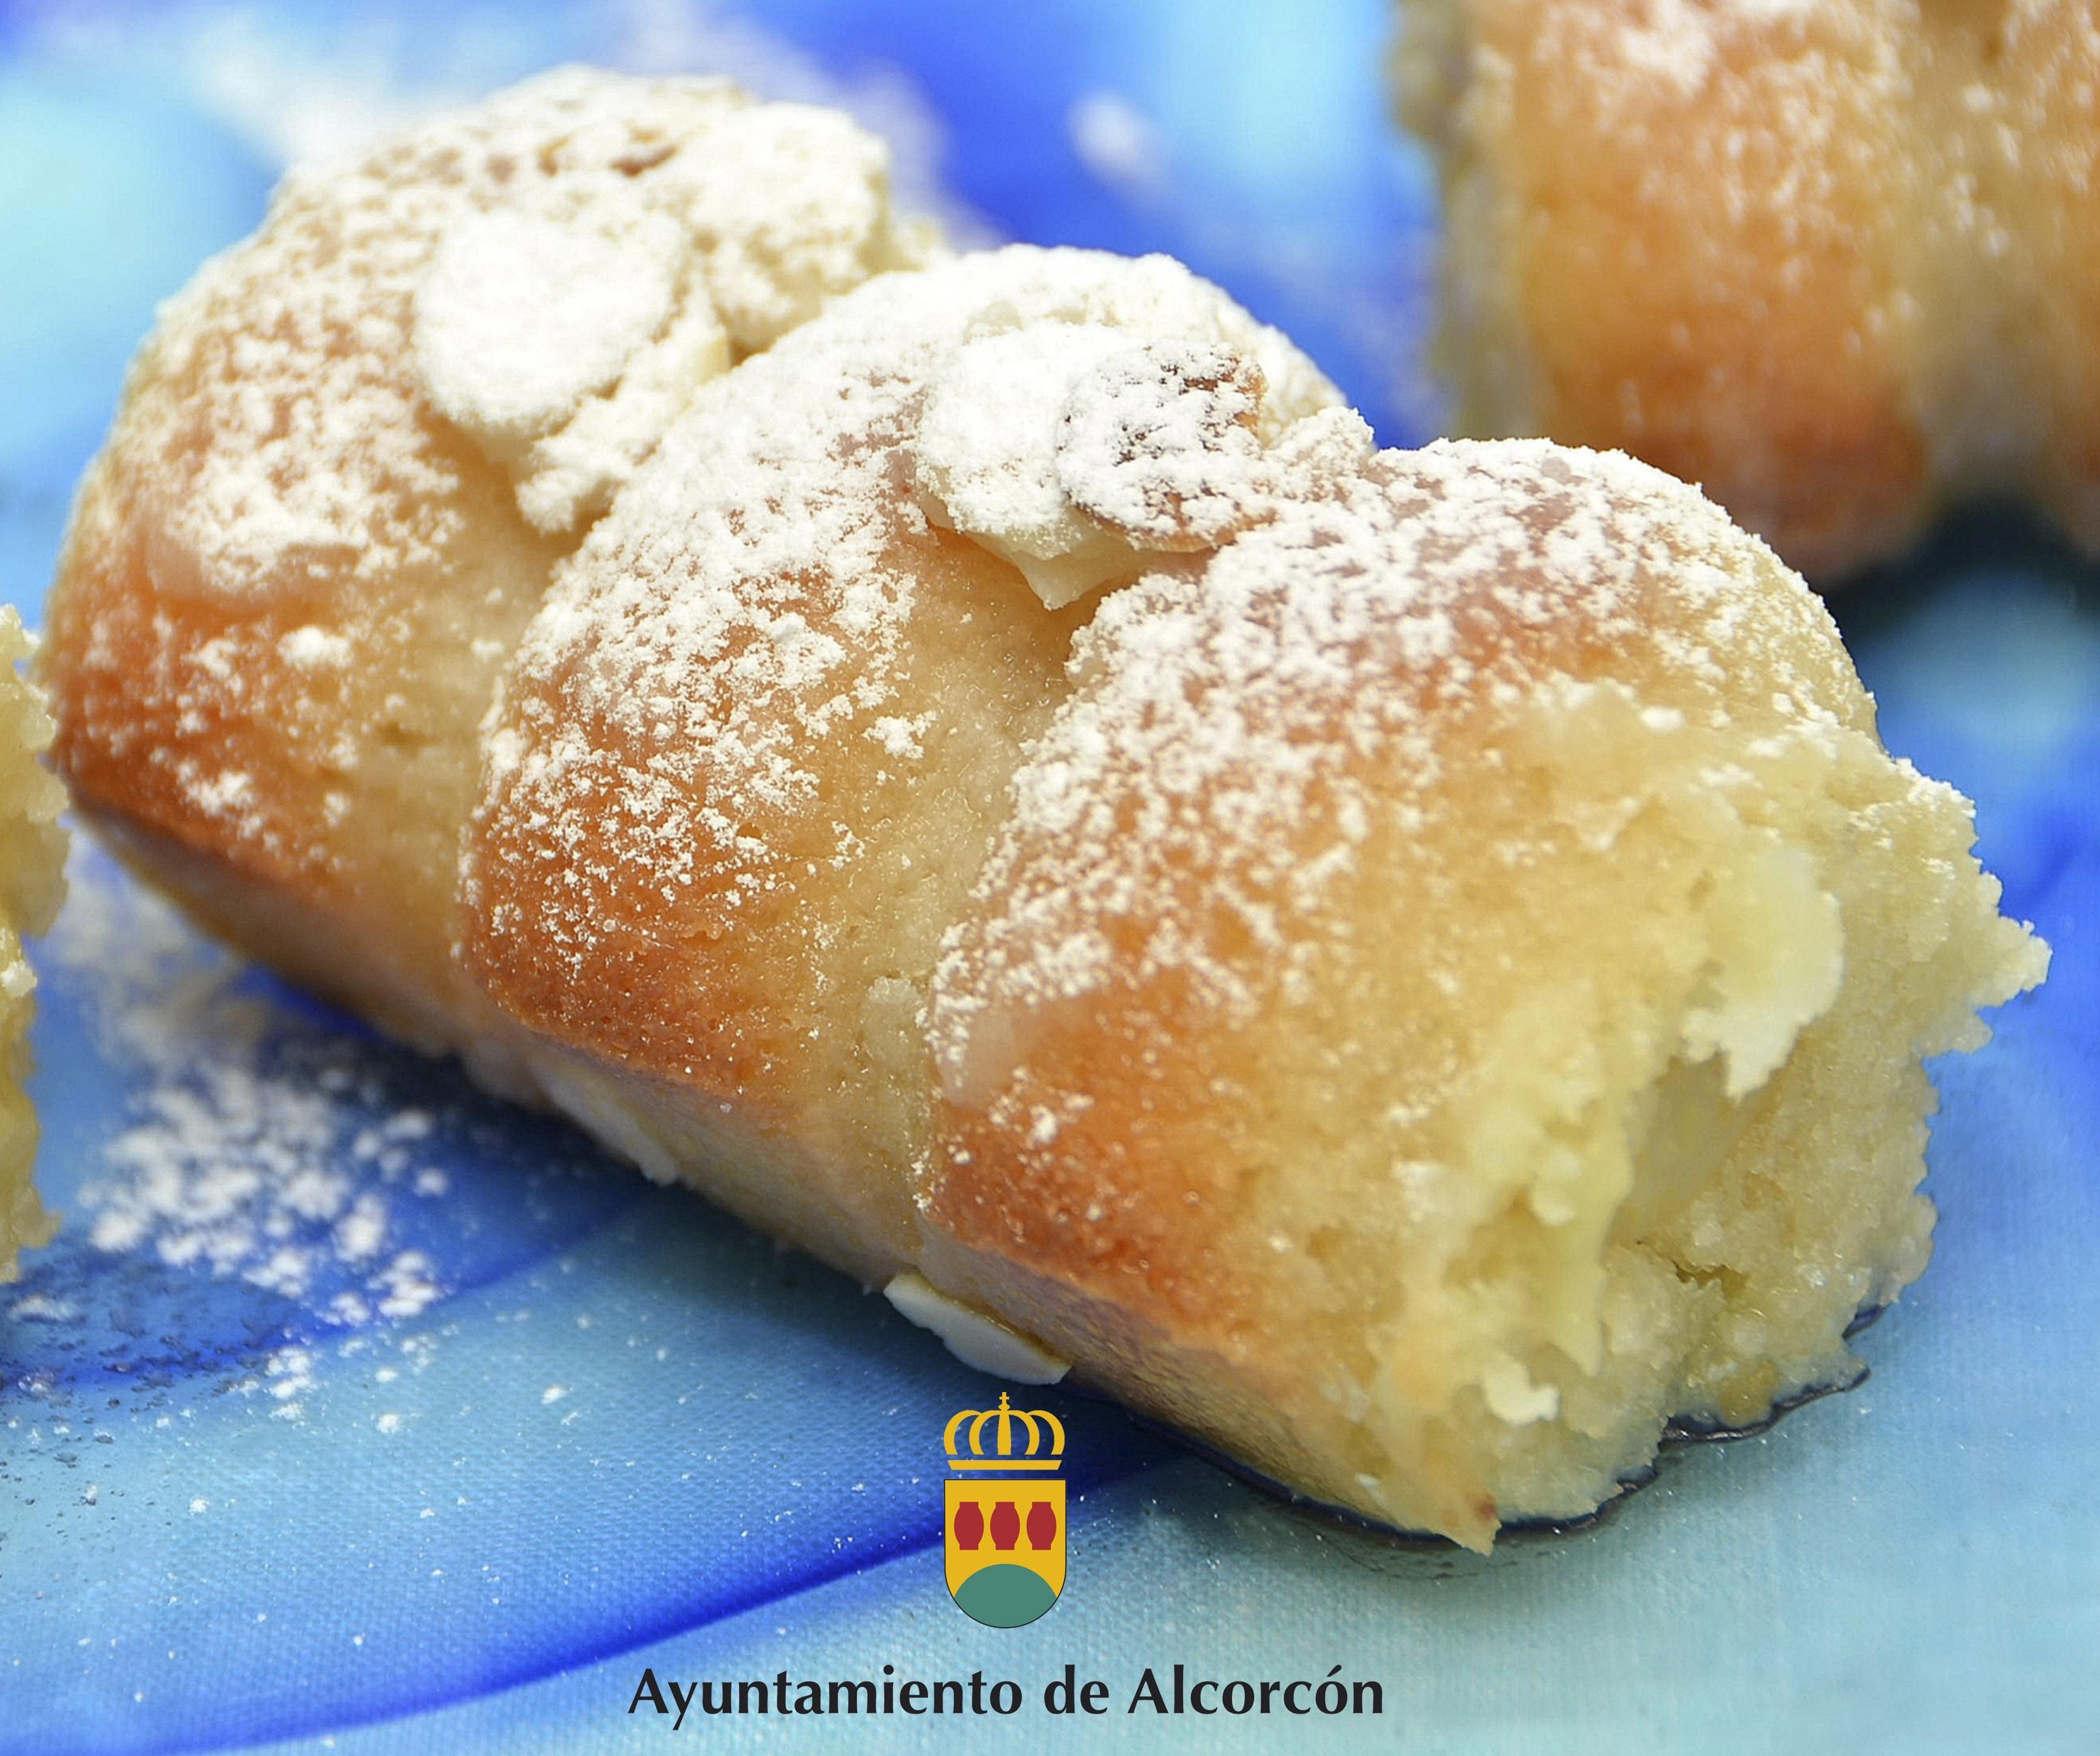 Imagen del dulce, Aguamanil